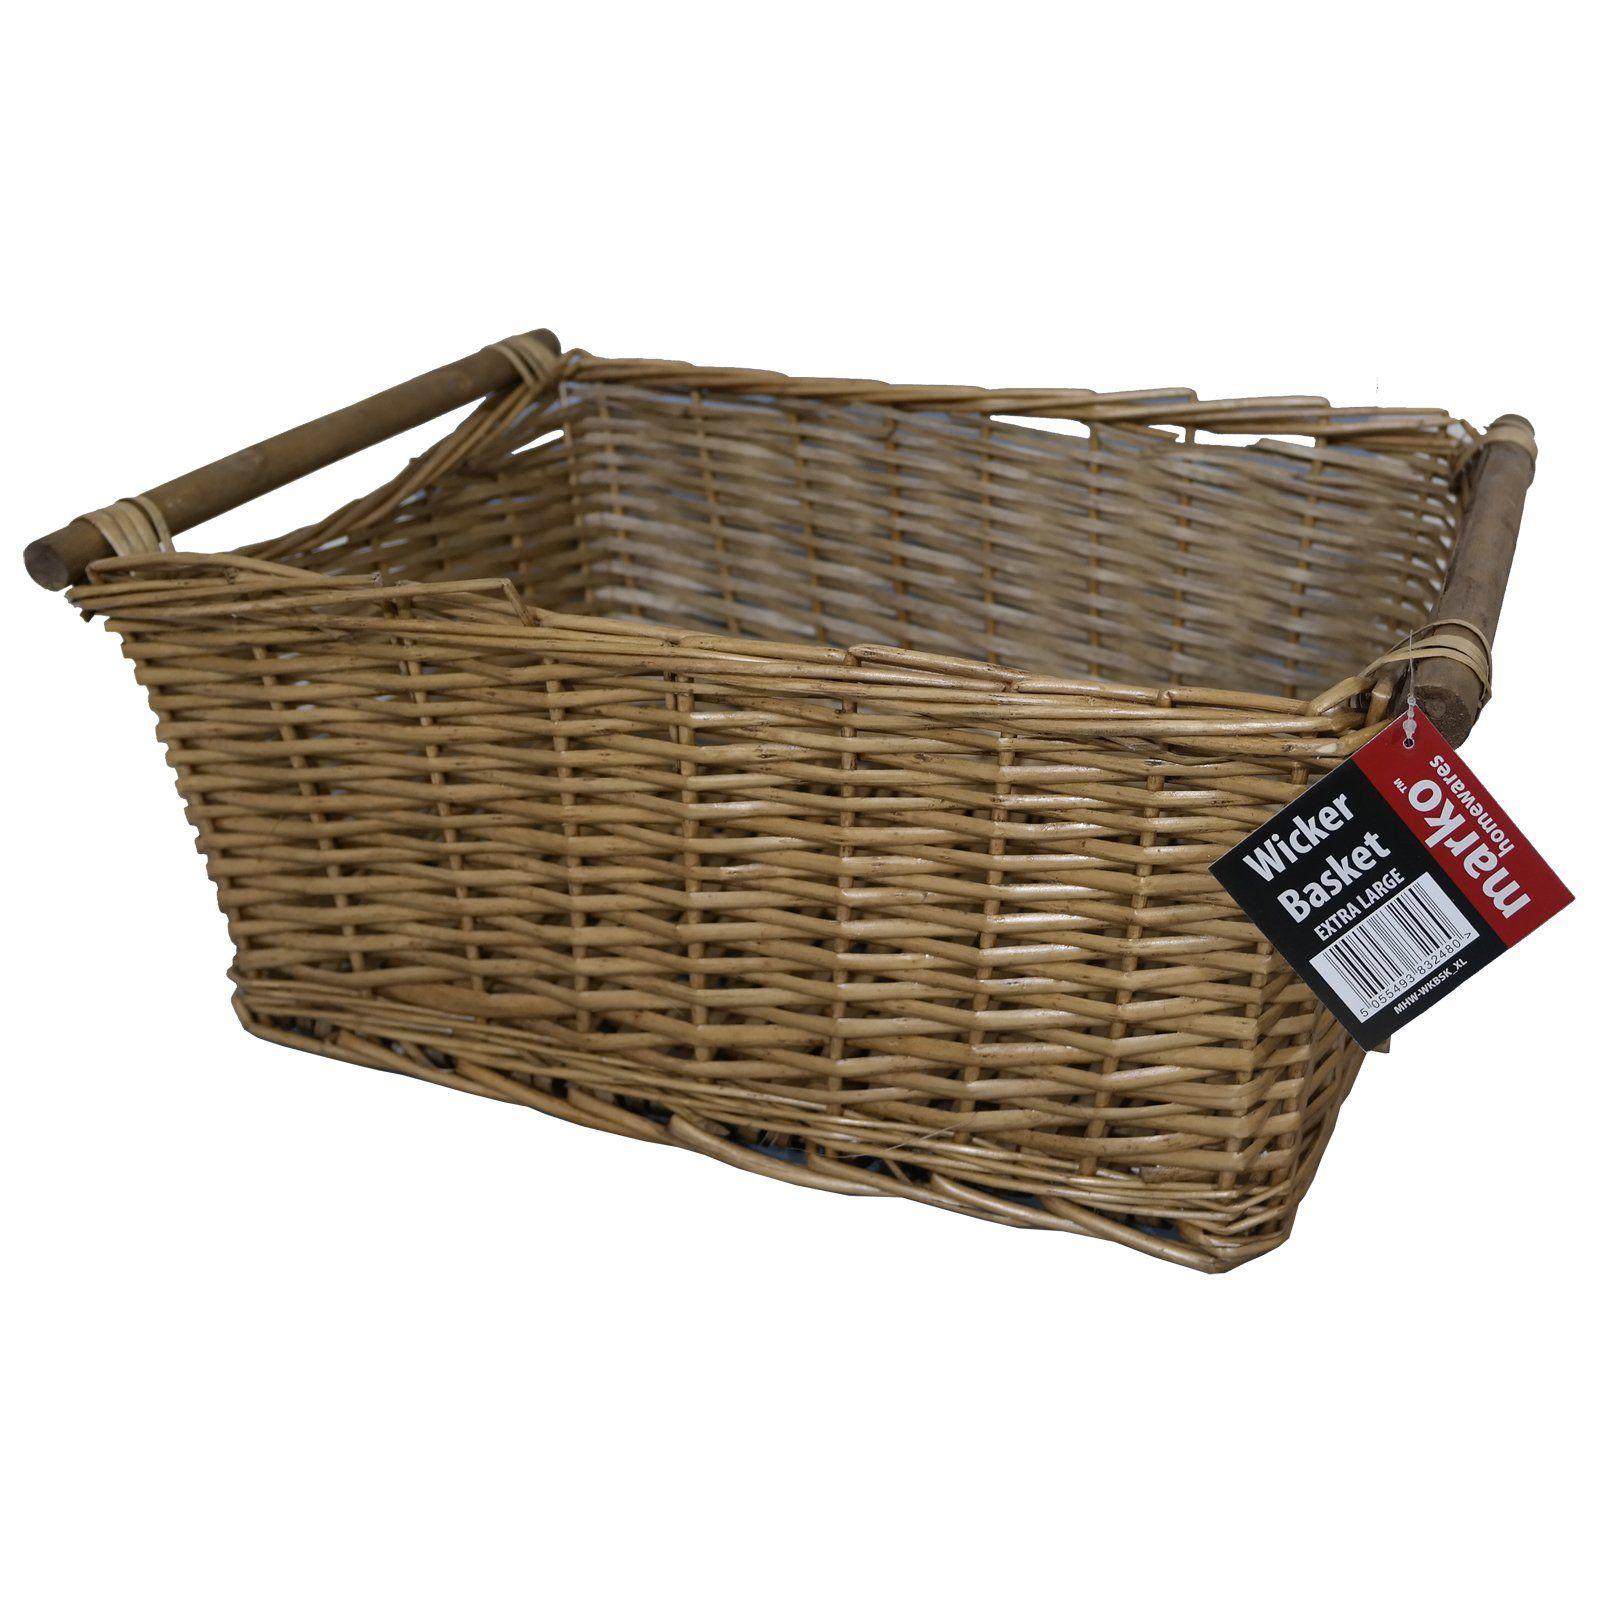 Extra large wicker storage basket household log fireside